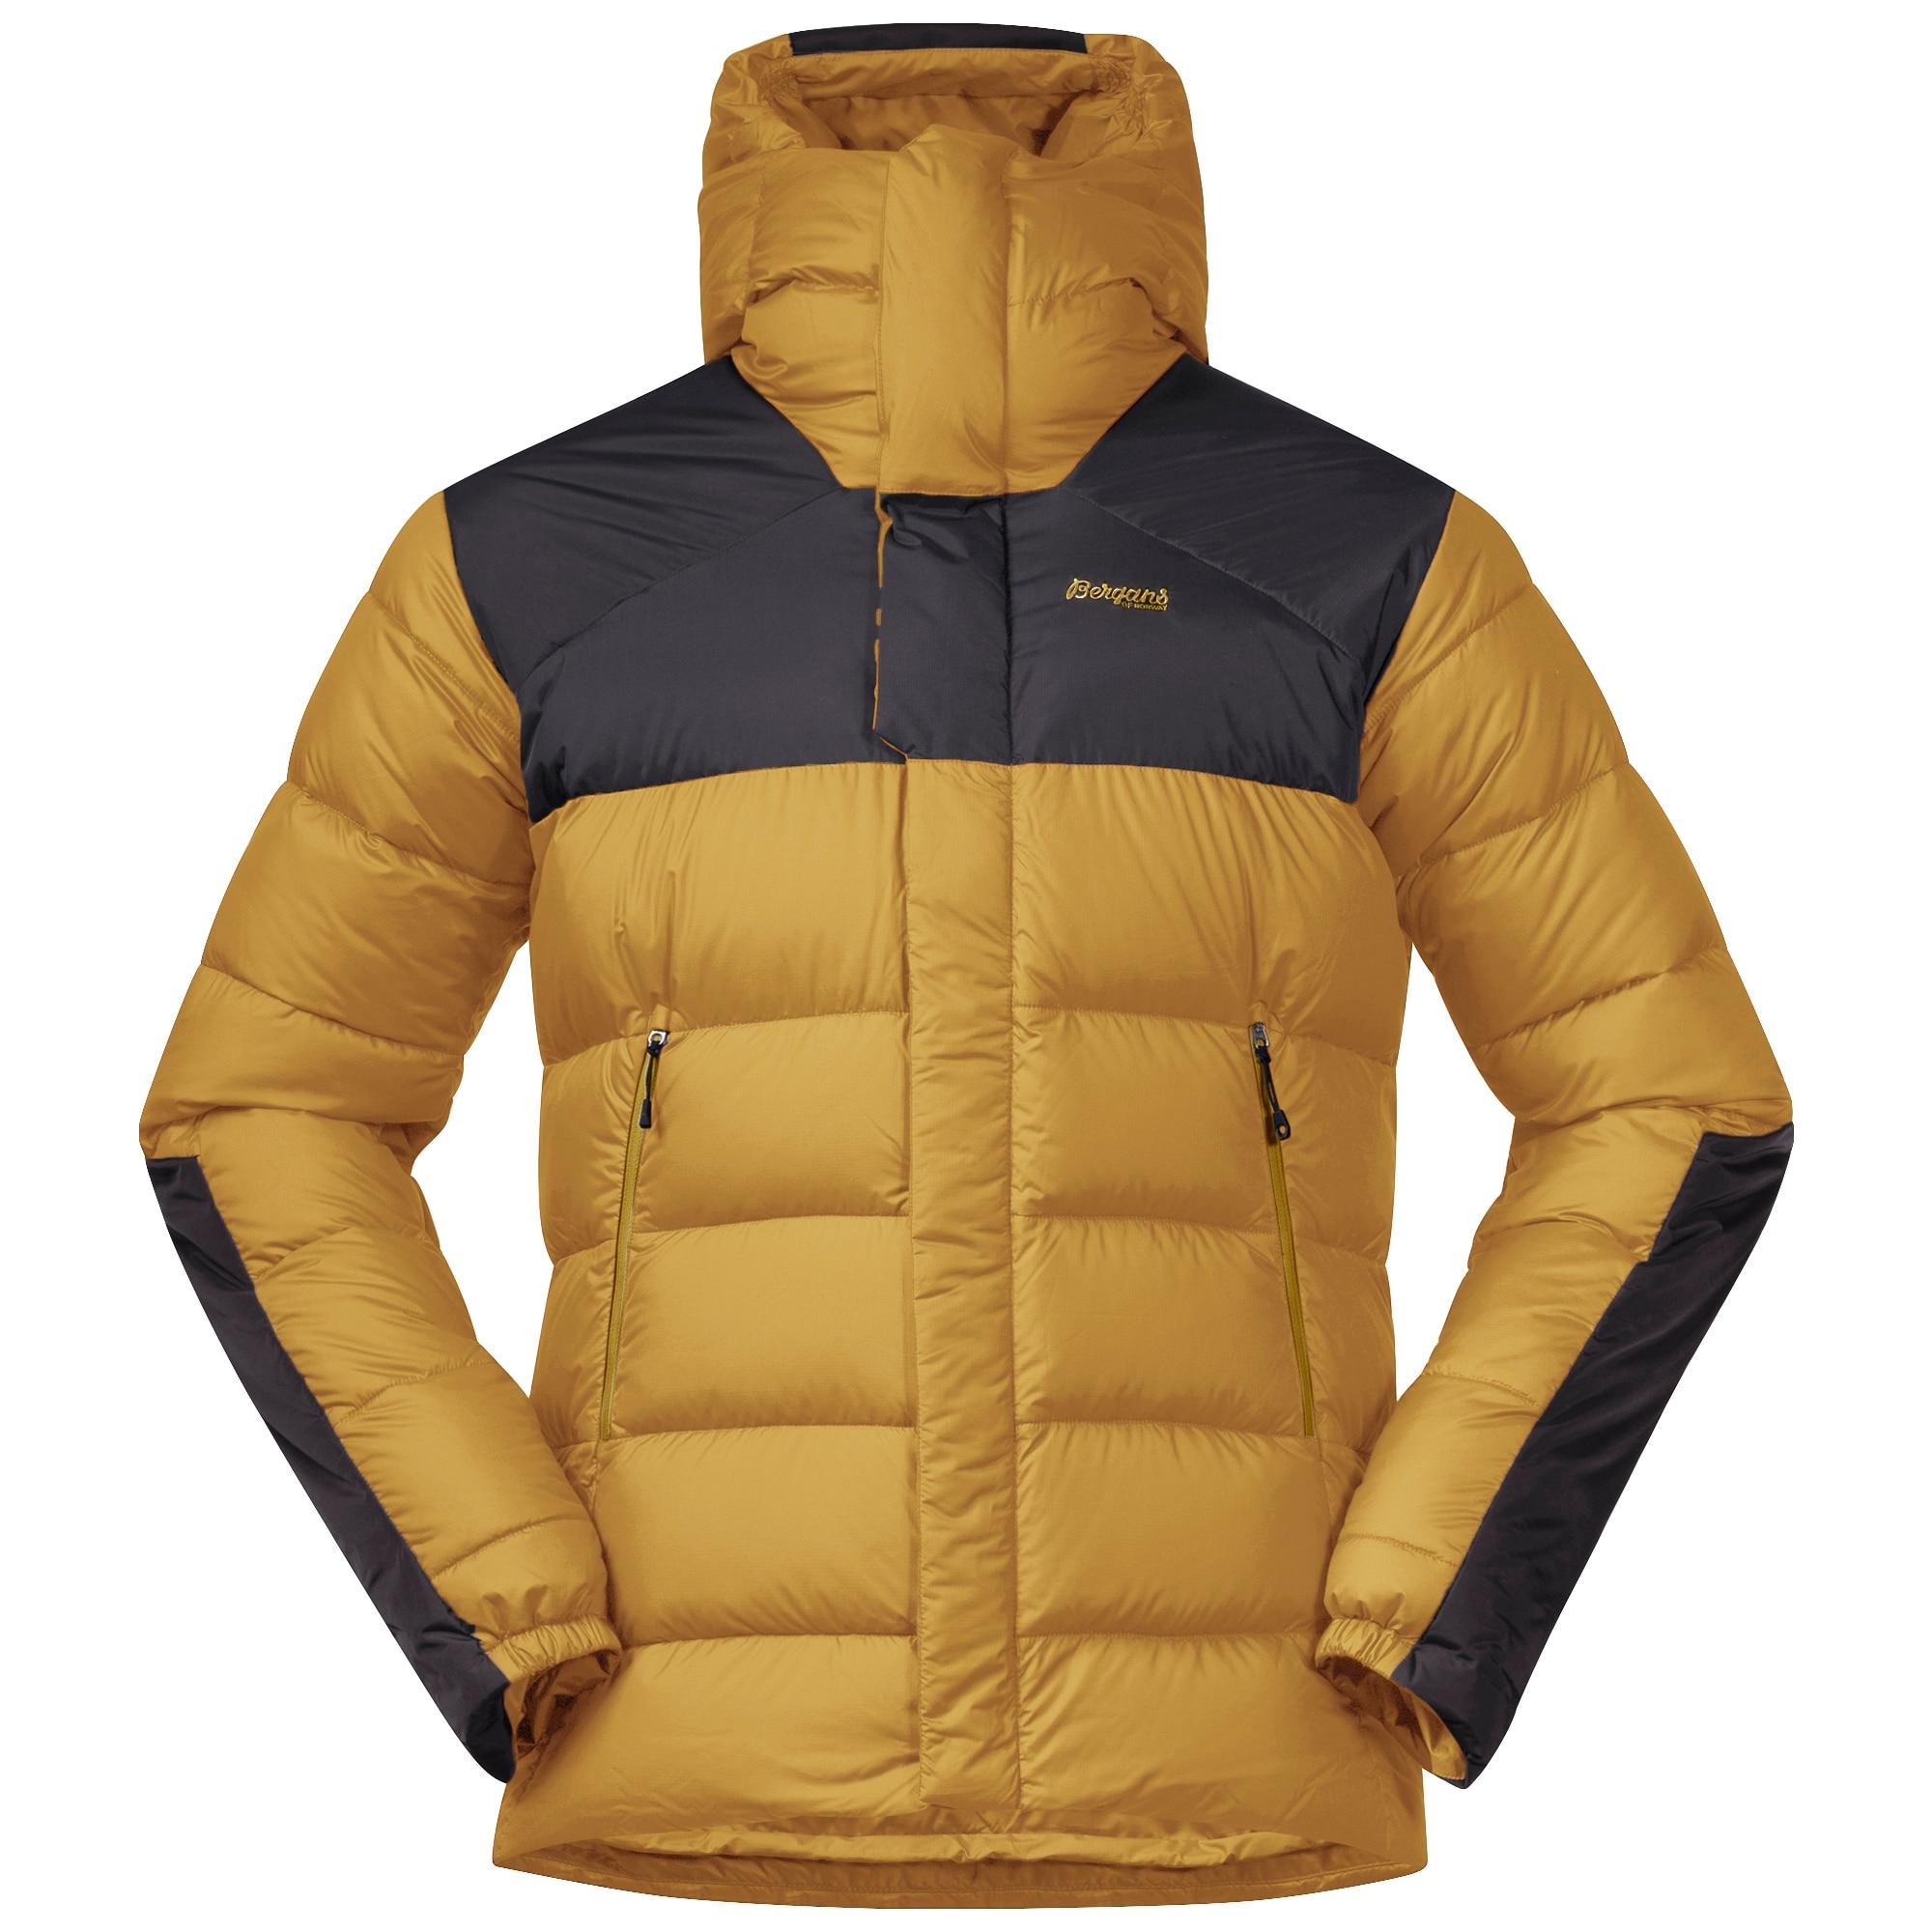 Rabot 365 Down Jacket